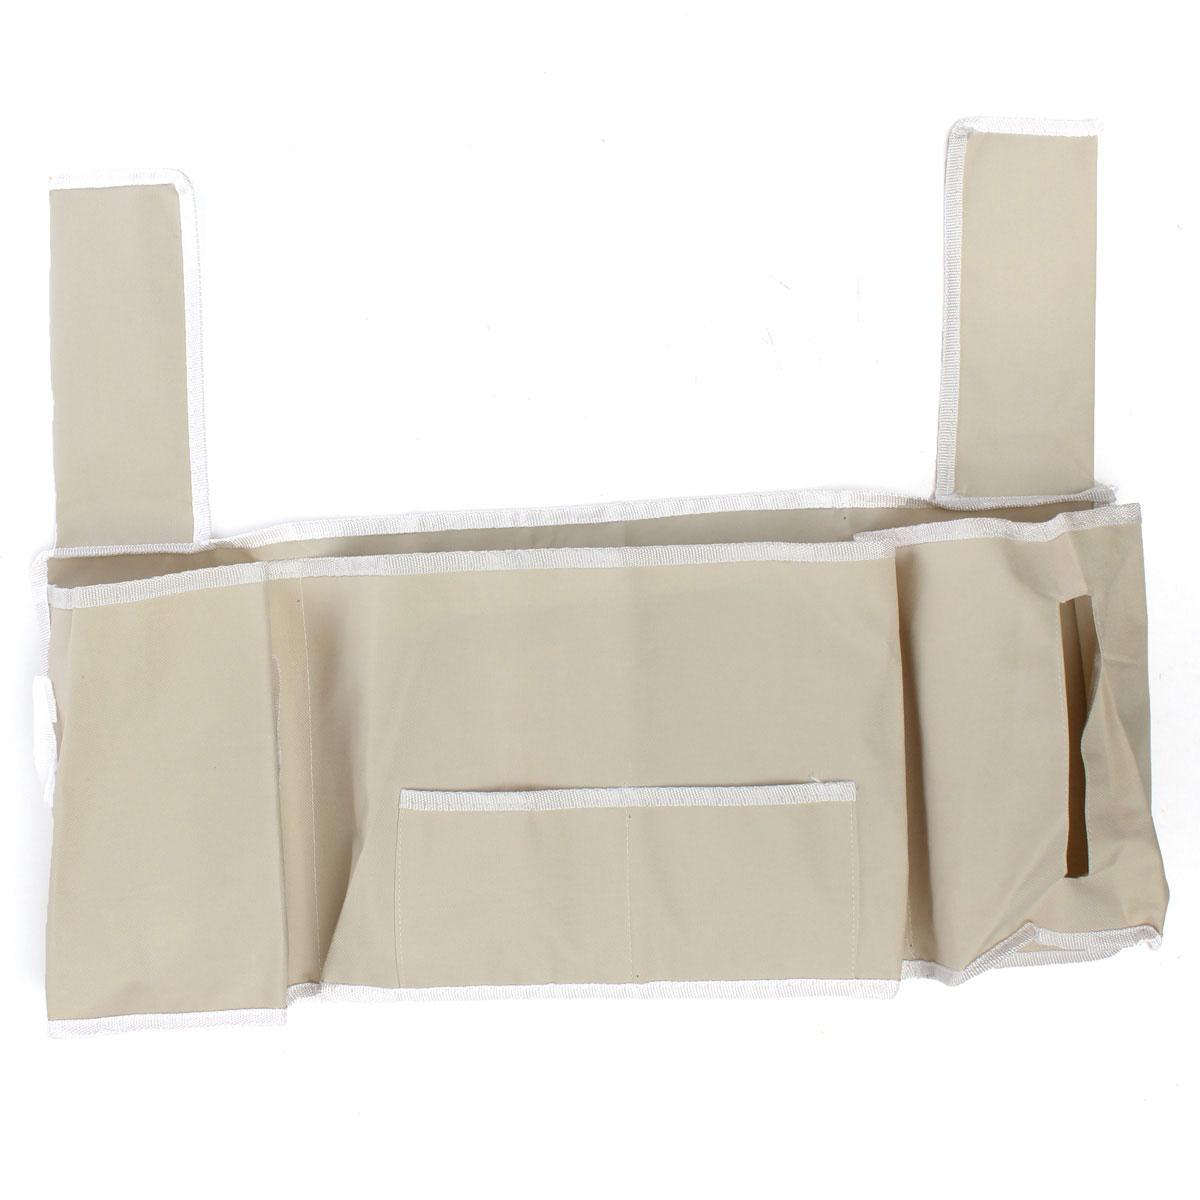 poche rangement suspendre sac mural lit organisateur range pliable vide poches. Black Bedroom Furniture Sets. Home Design Ideas